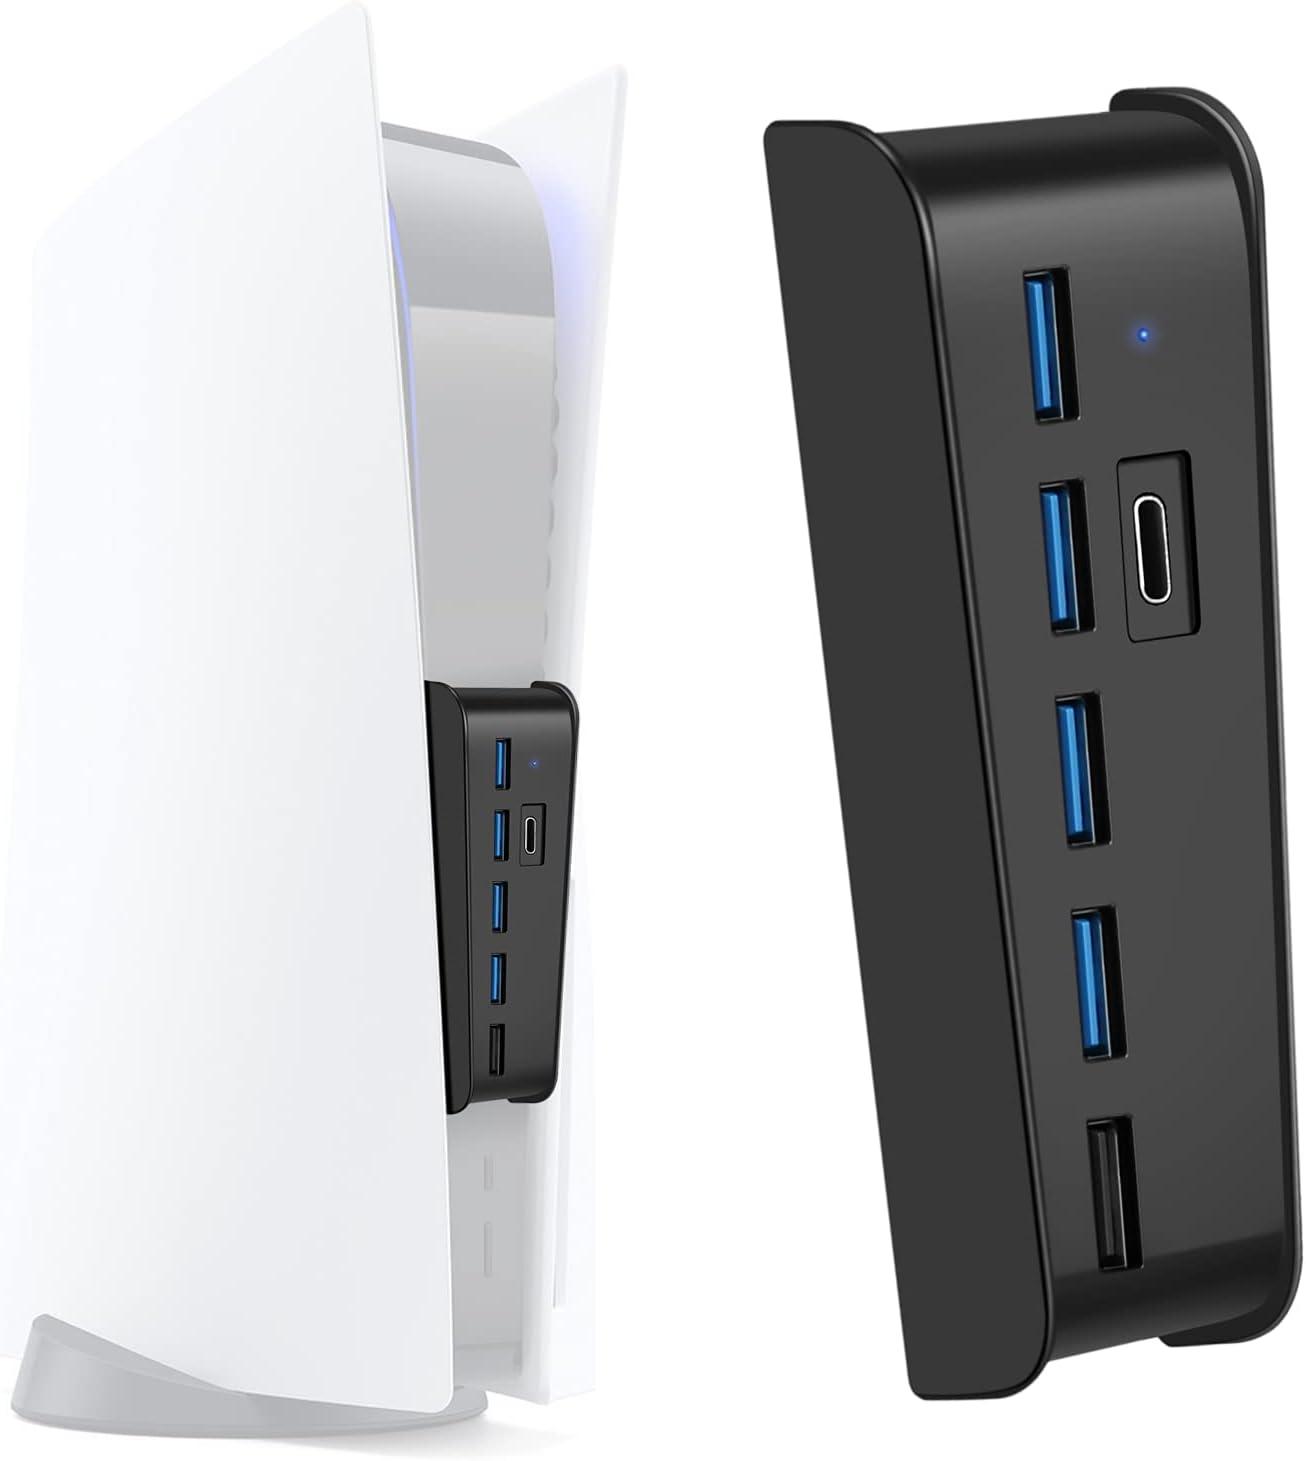 TNP Spasm price PS5 USB Hub 3.1 security C Type Transmi Extension High-Speed